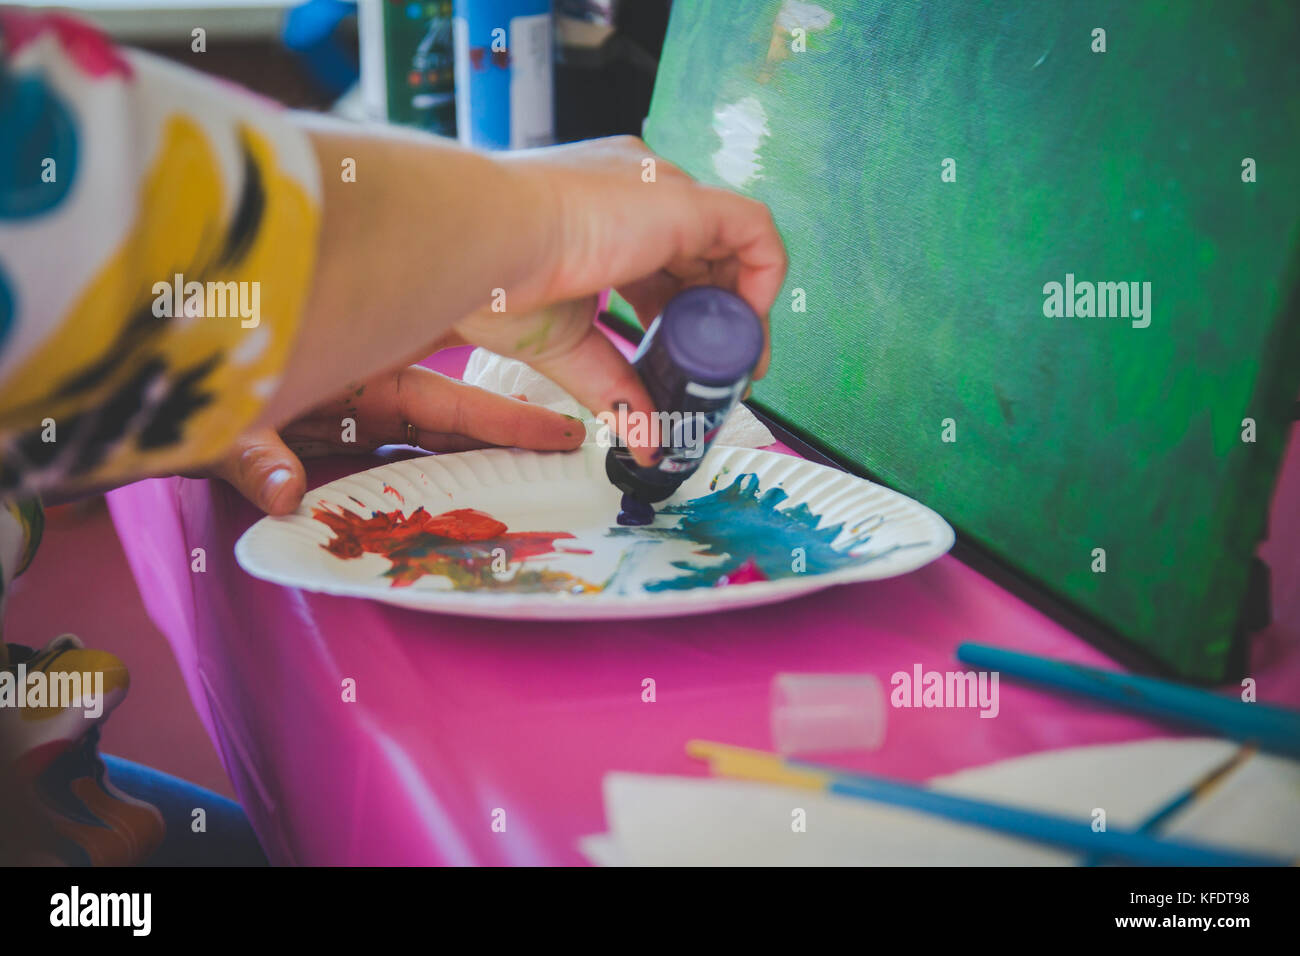 Artist holding paint brush painting canvas - Stock Image